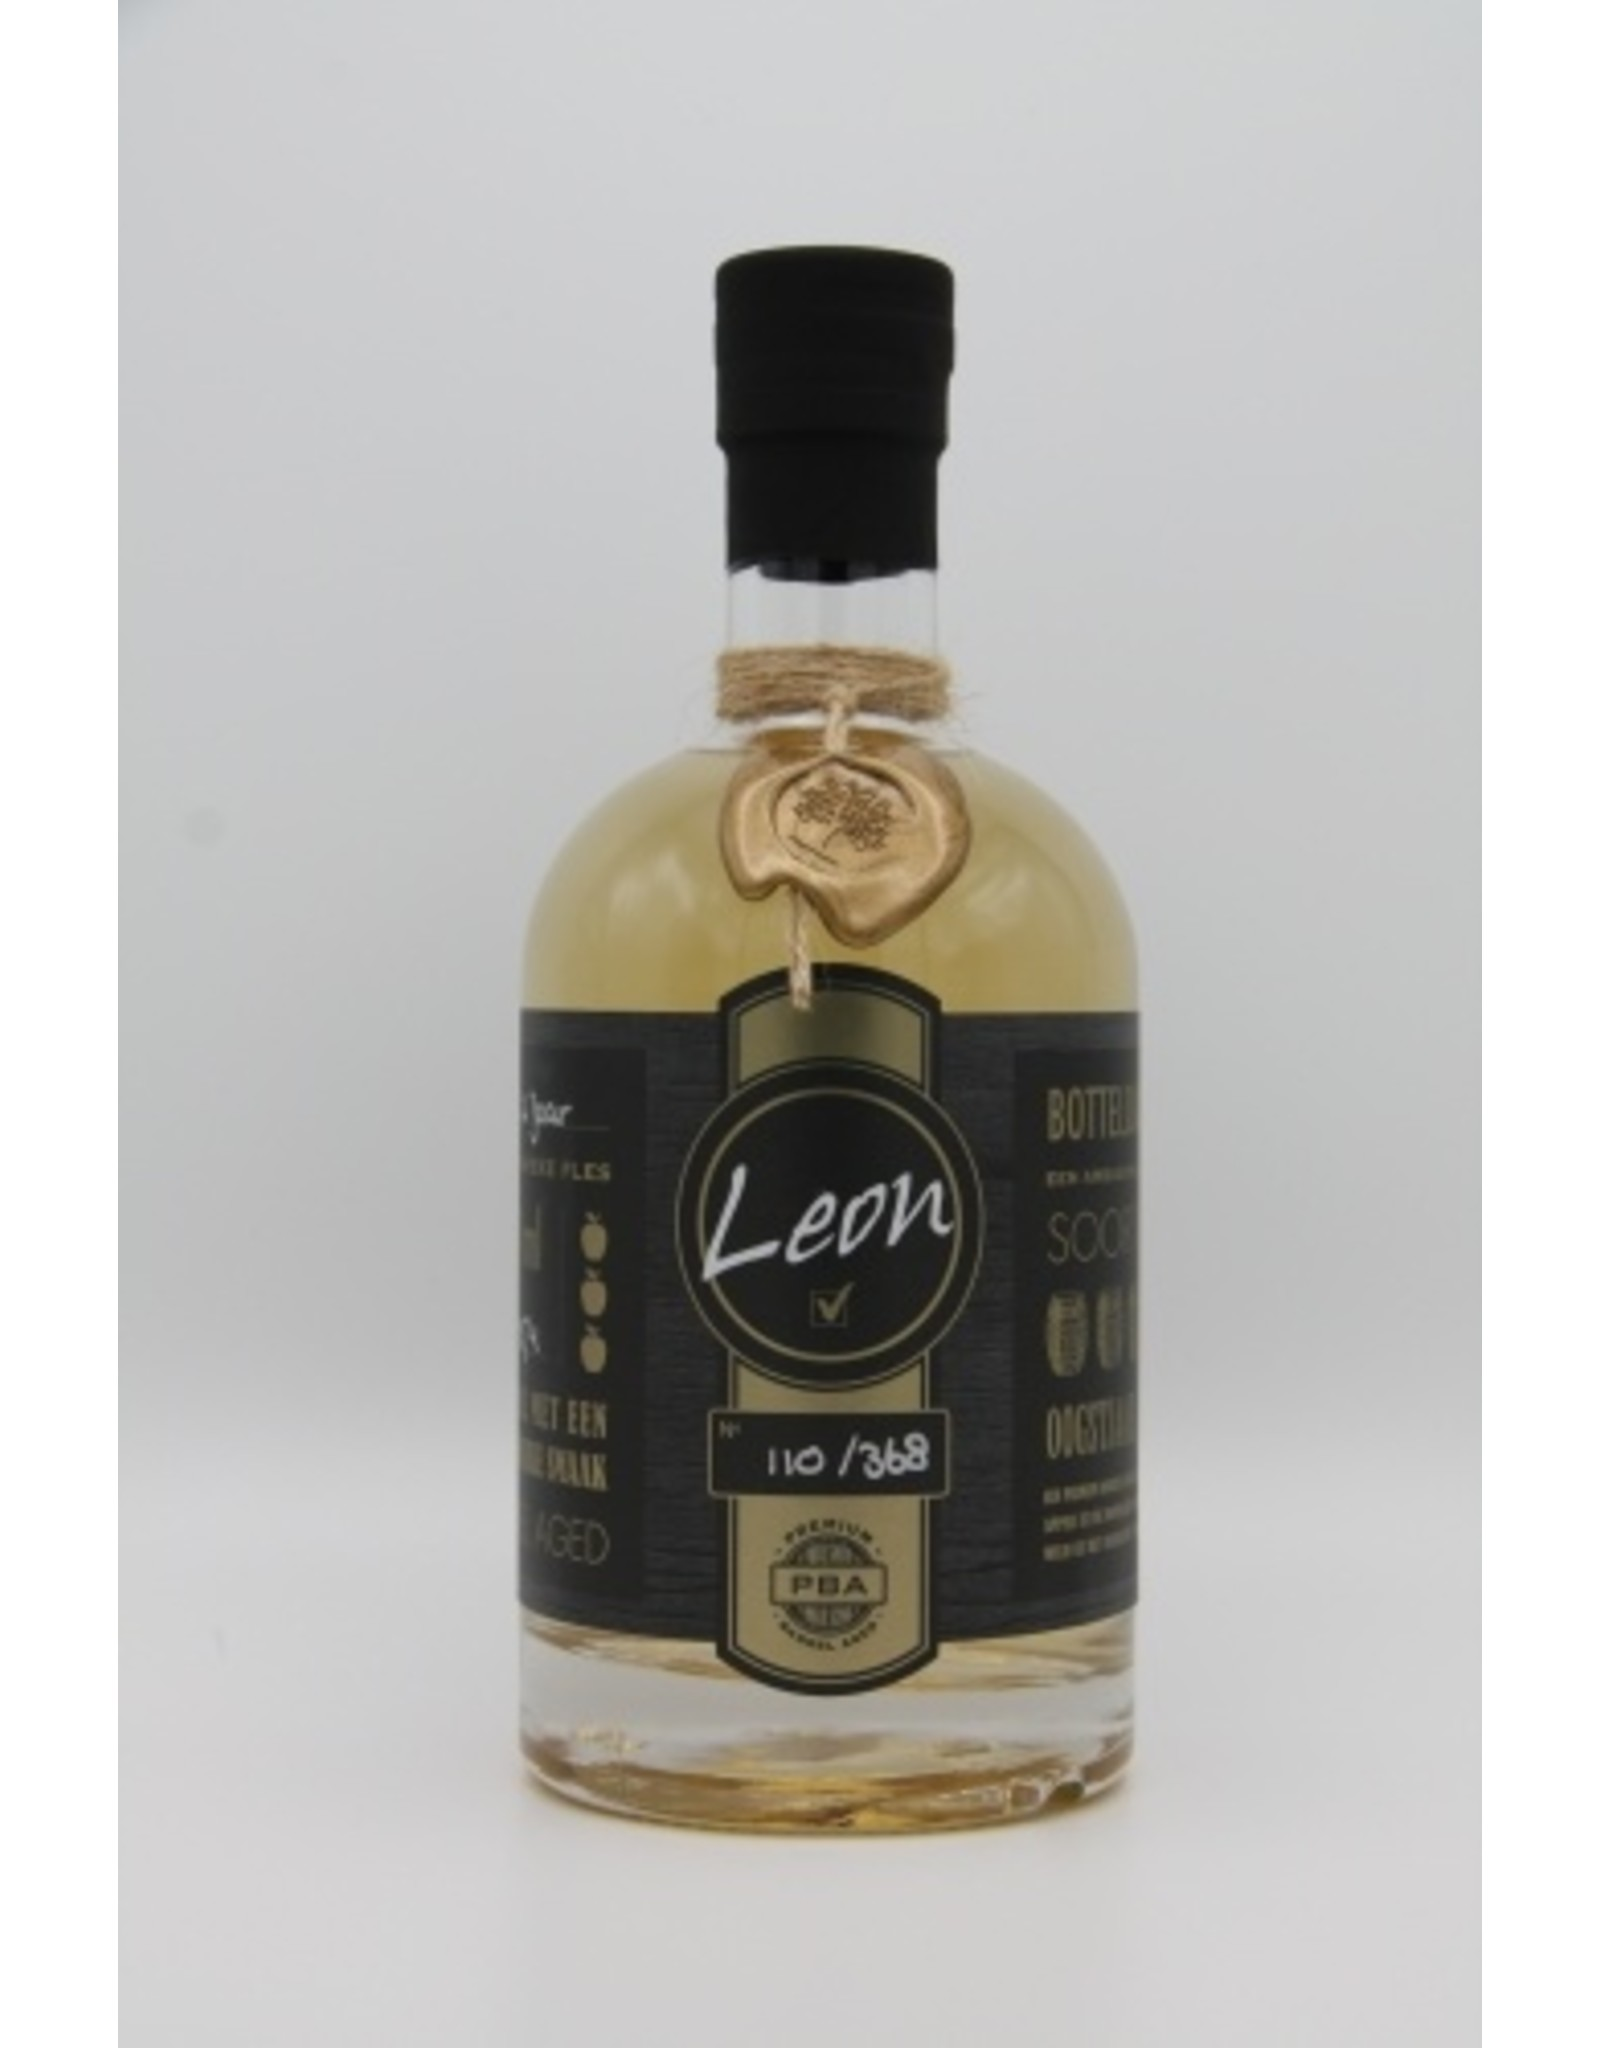 Leon Leon P.B.A. Clynelish 70cl